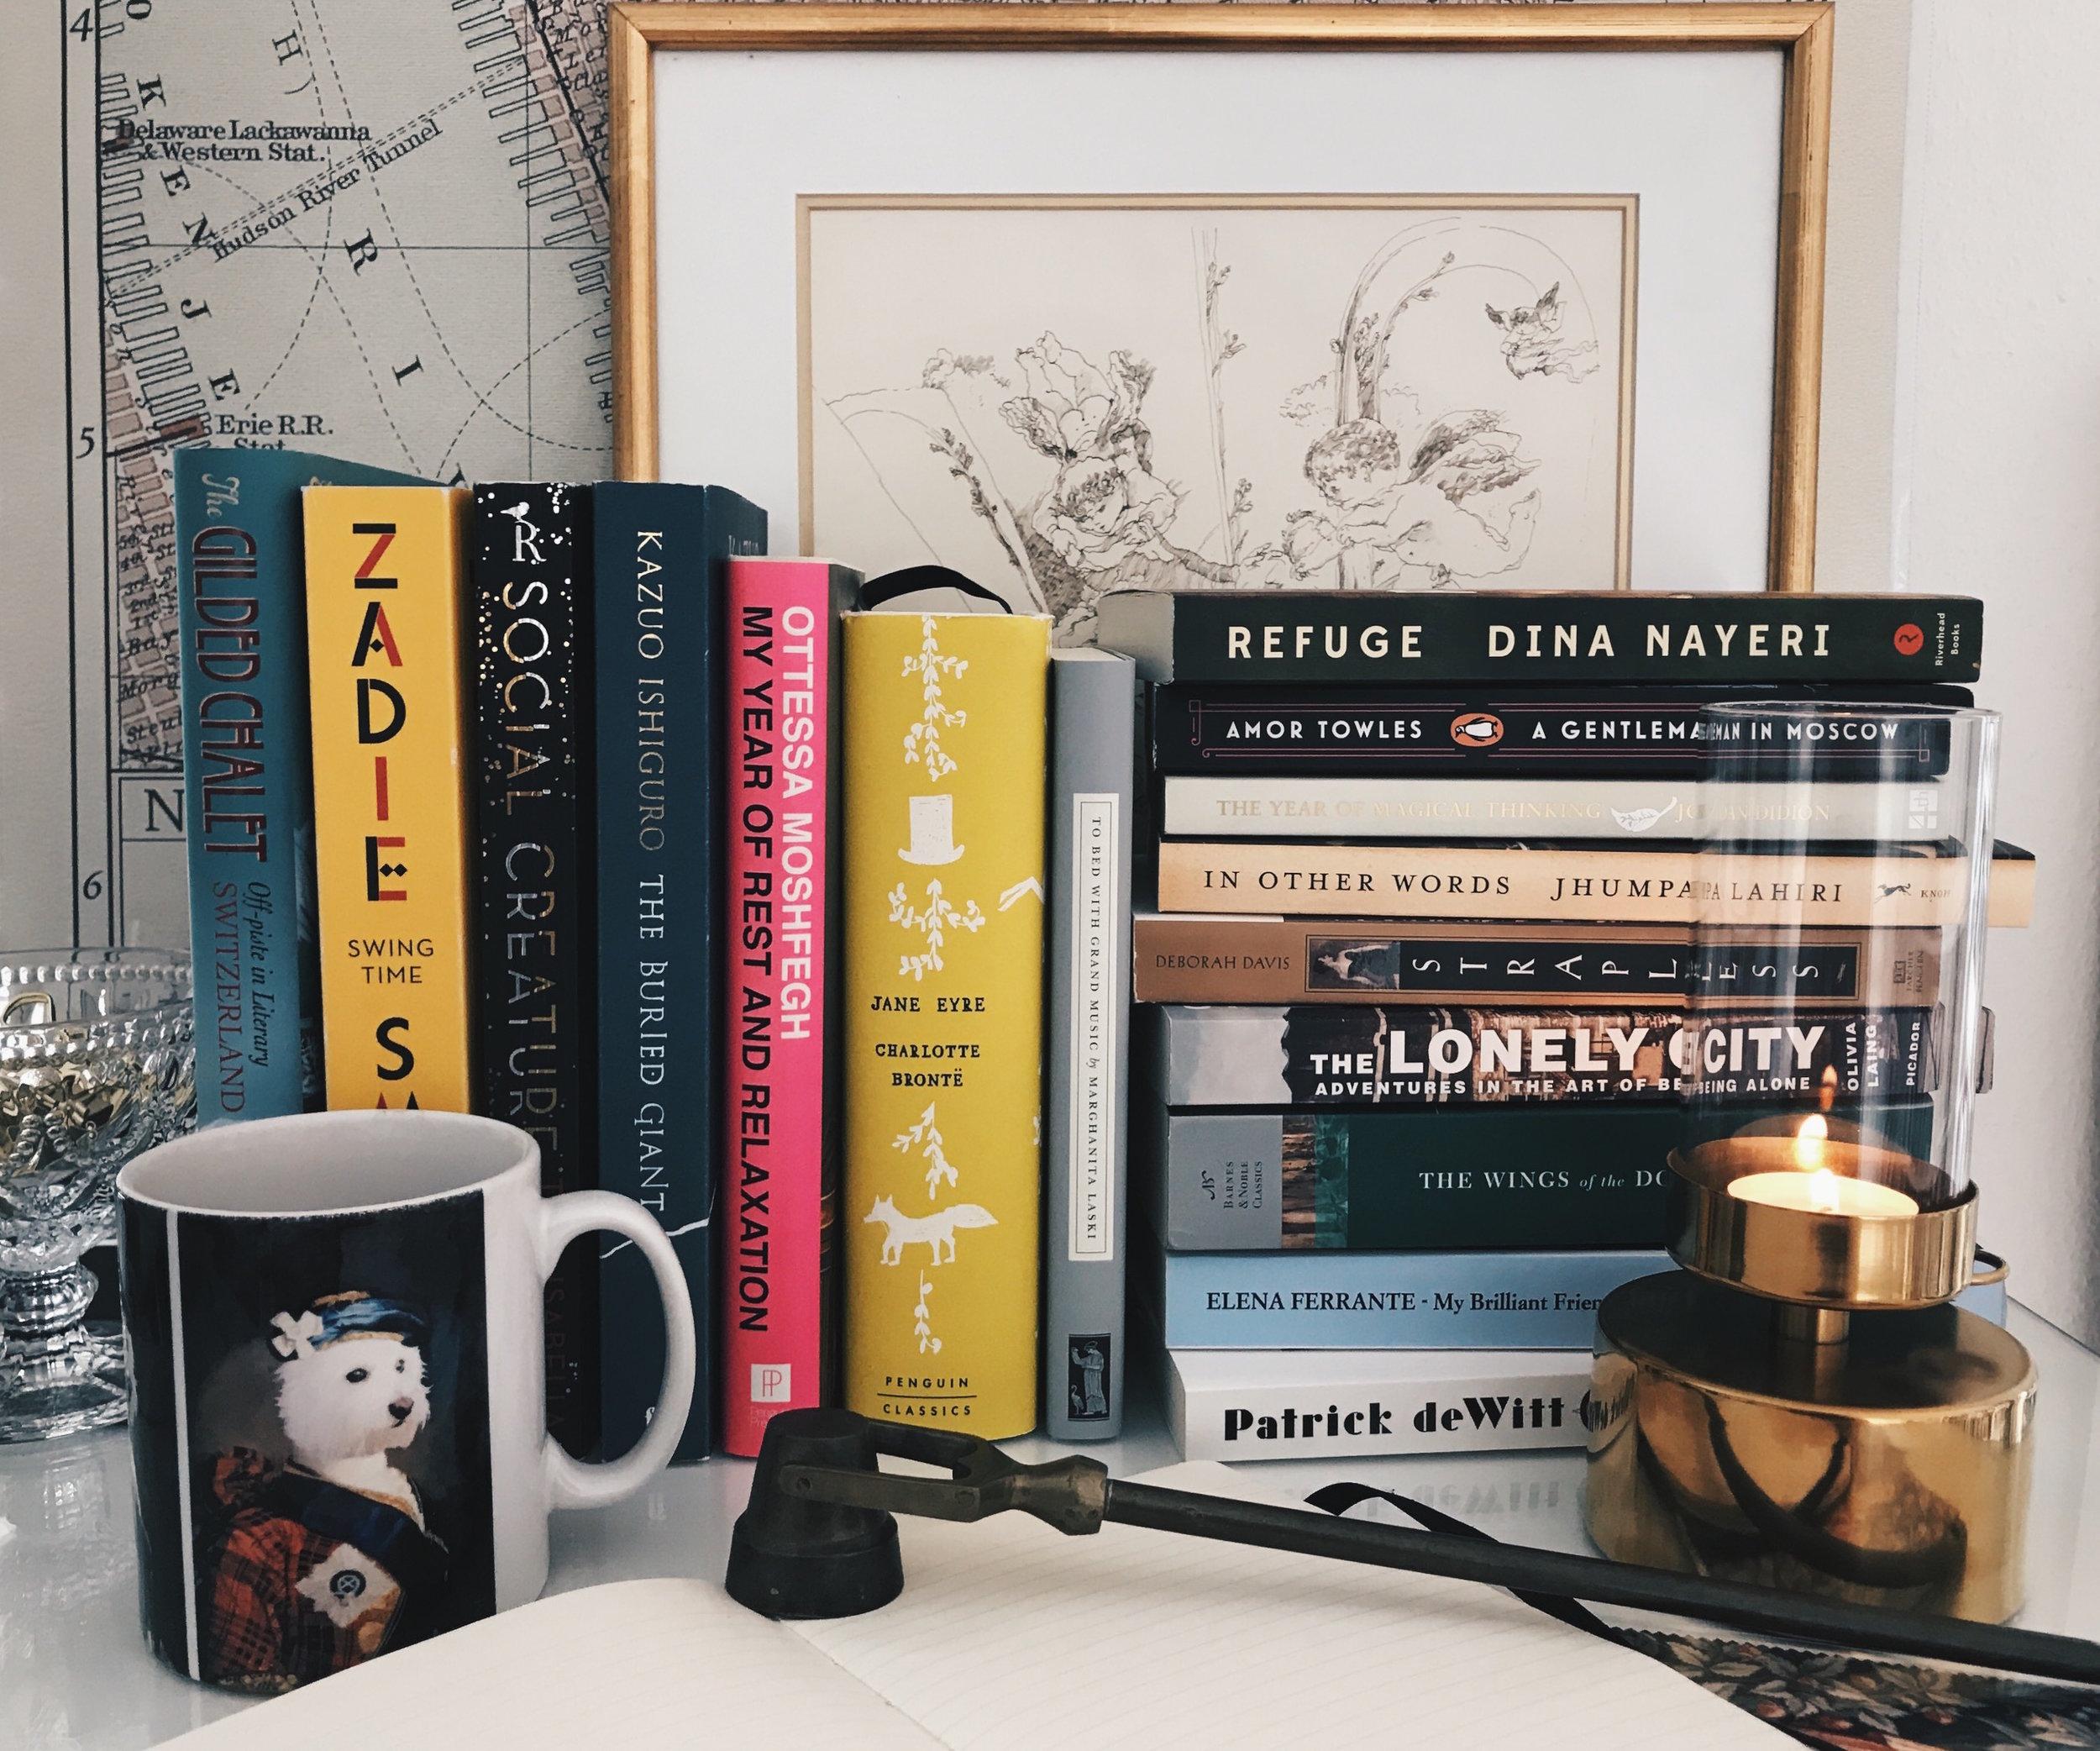 Winter Reading List 2019 The Attic on Eighth.jpg